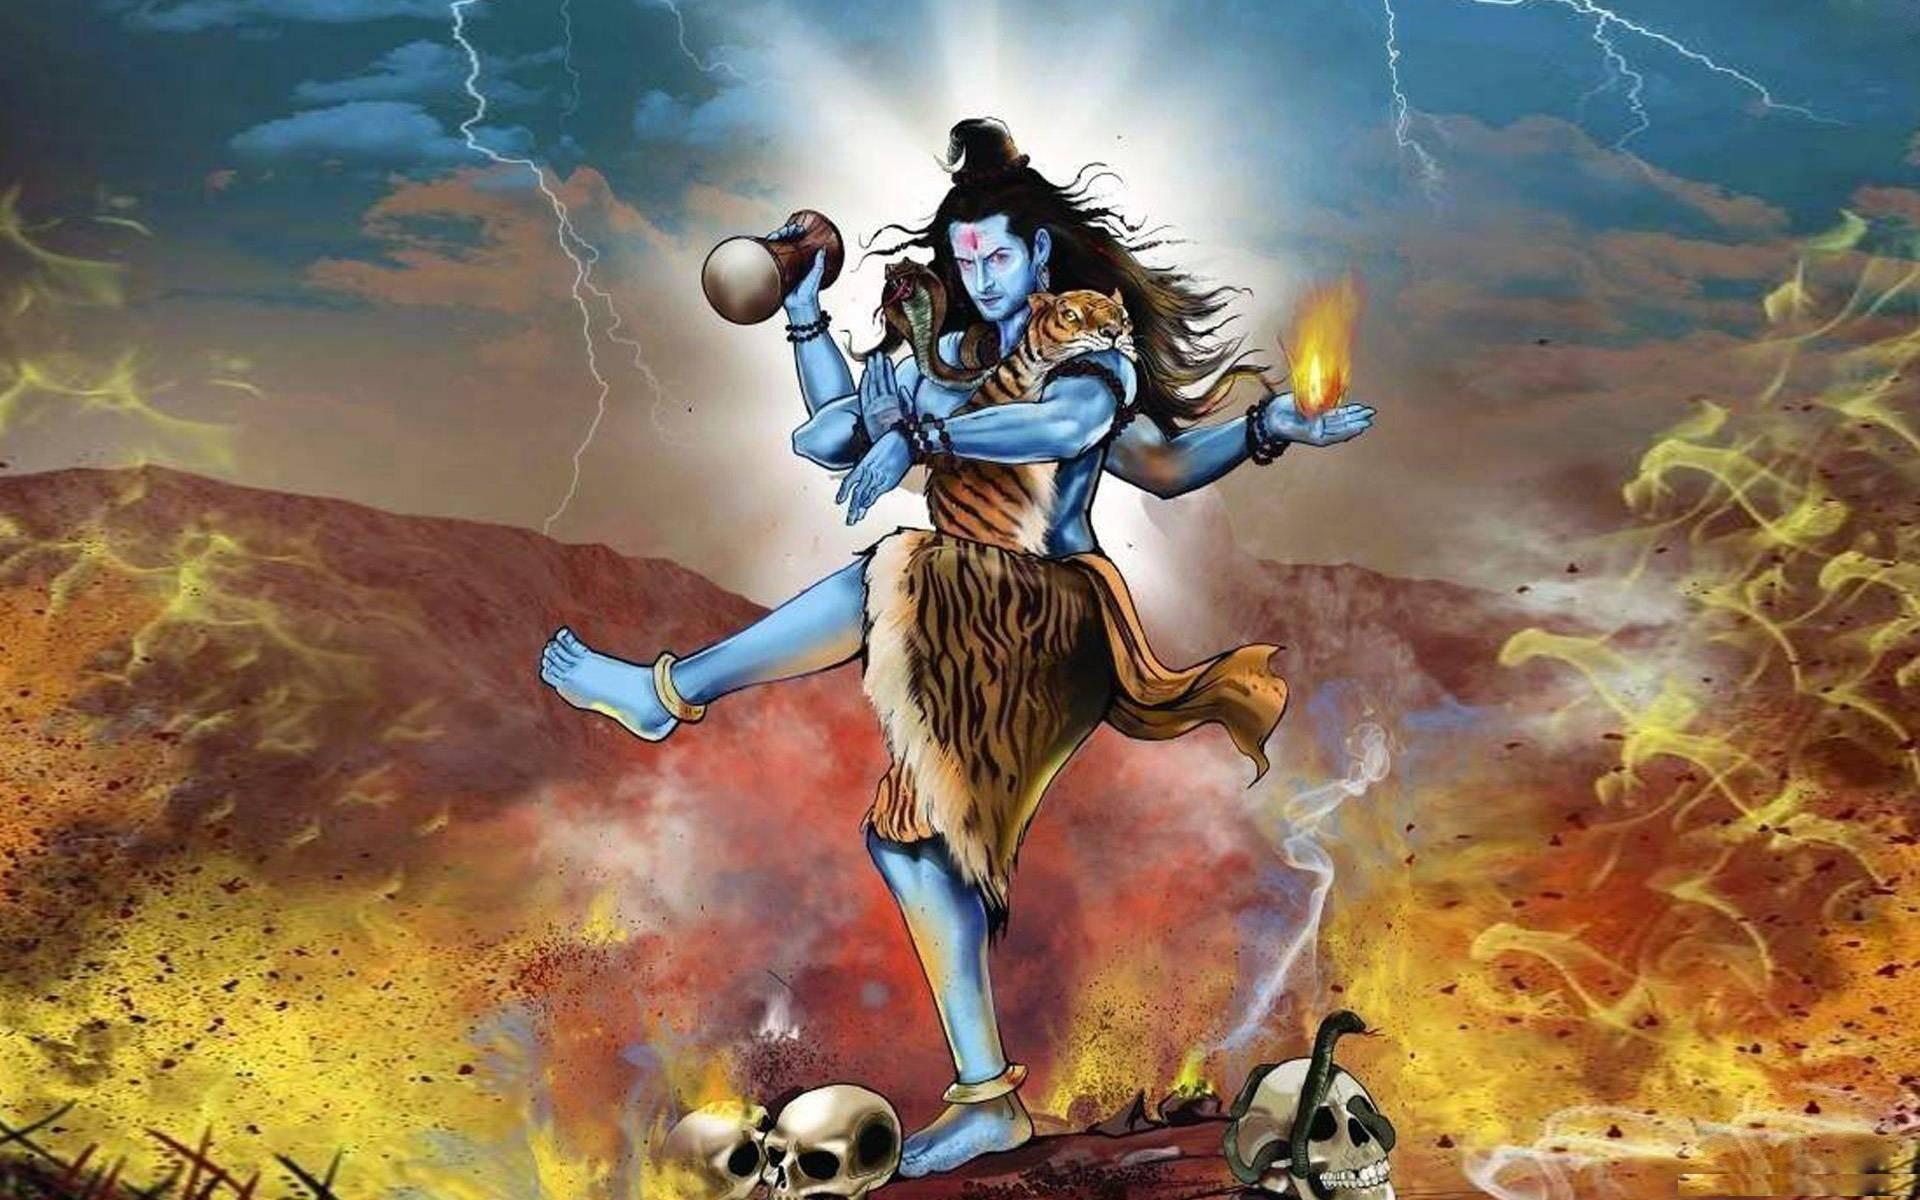 [49+] Lord Shiva HD Wallpapers on WallpaperSafari